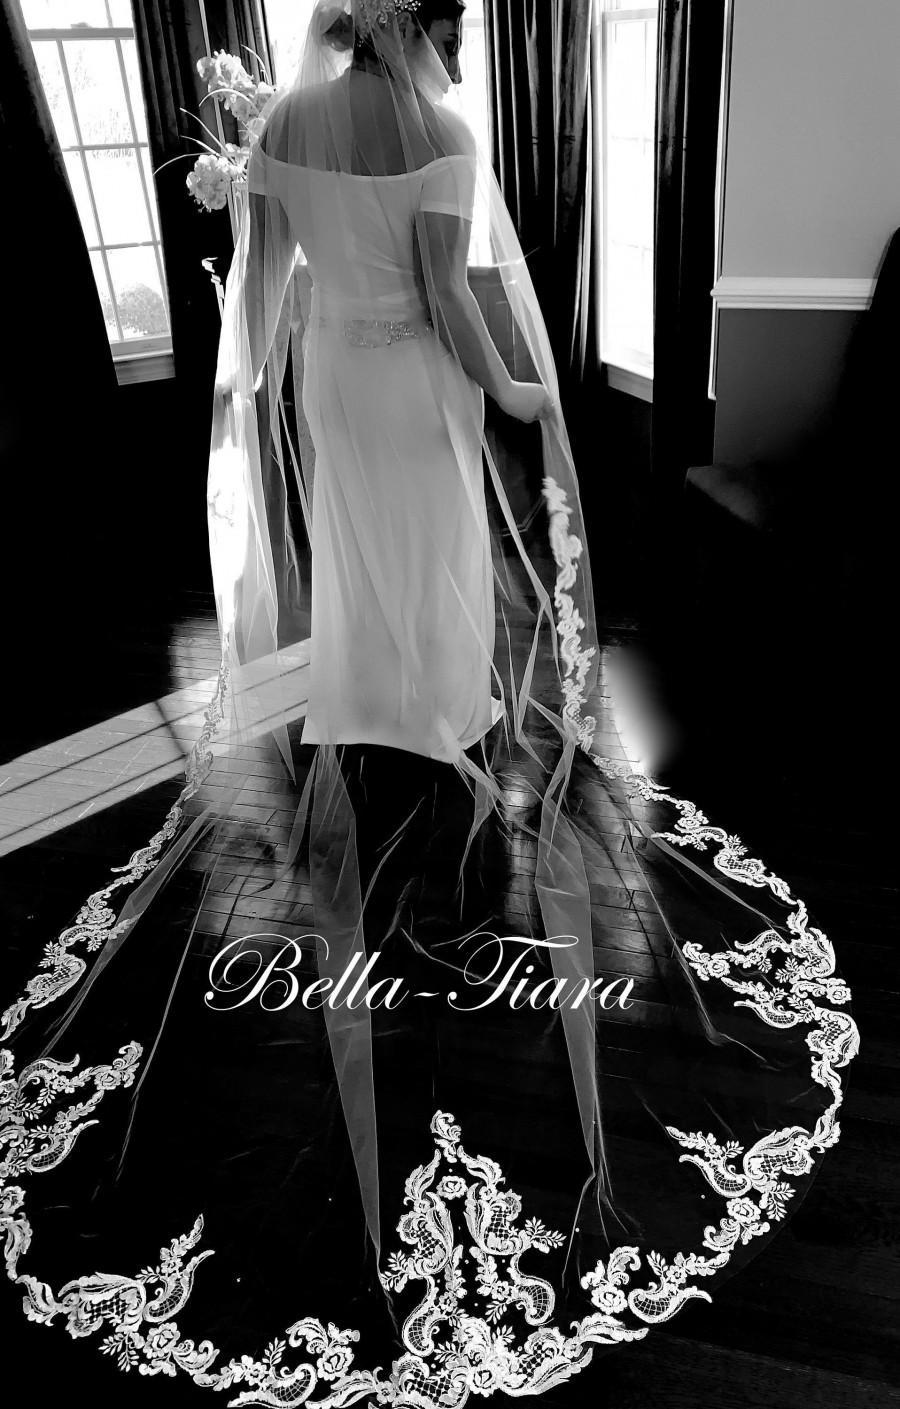 Hochzeit - royal cathedral wedding veil, lace trim cathedral veil, vintage lace cathedral veil, royal cathedral long veil, long wedding veil